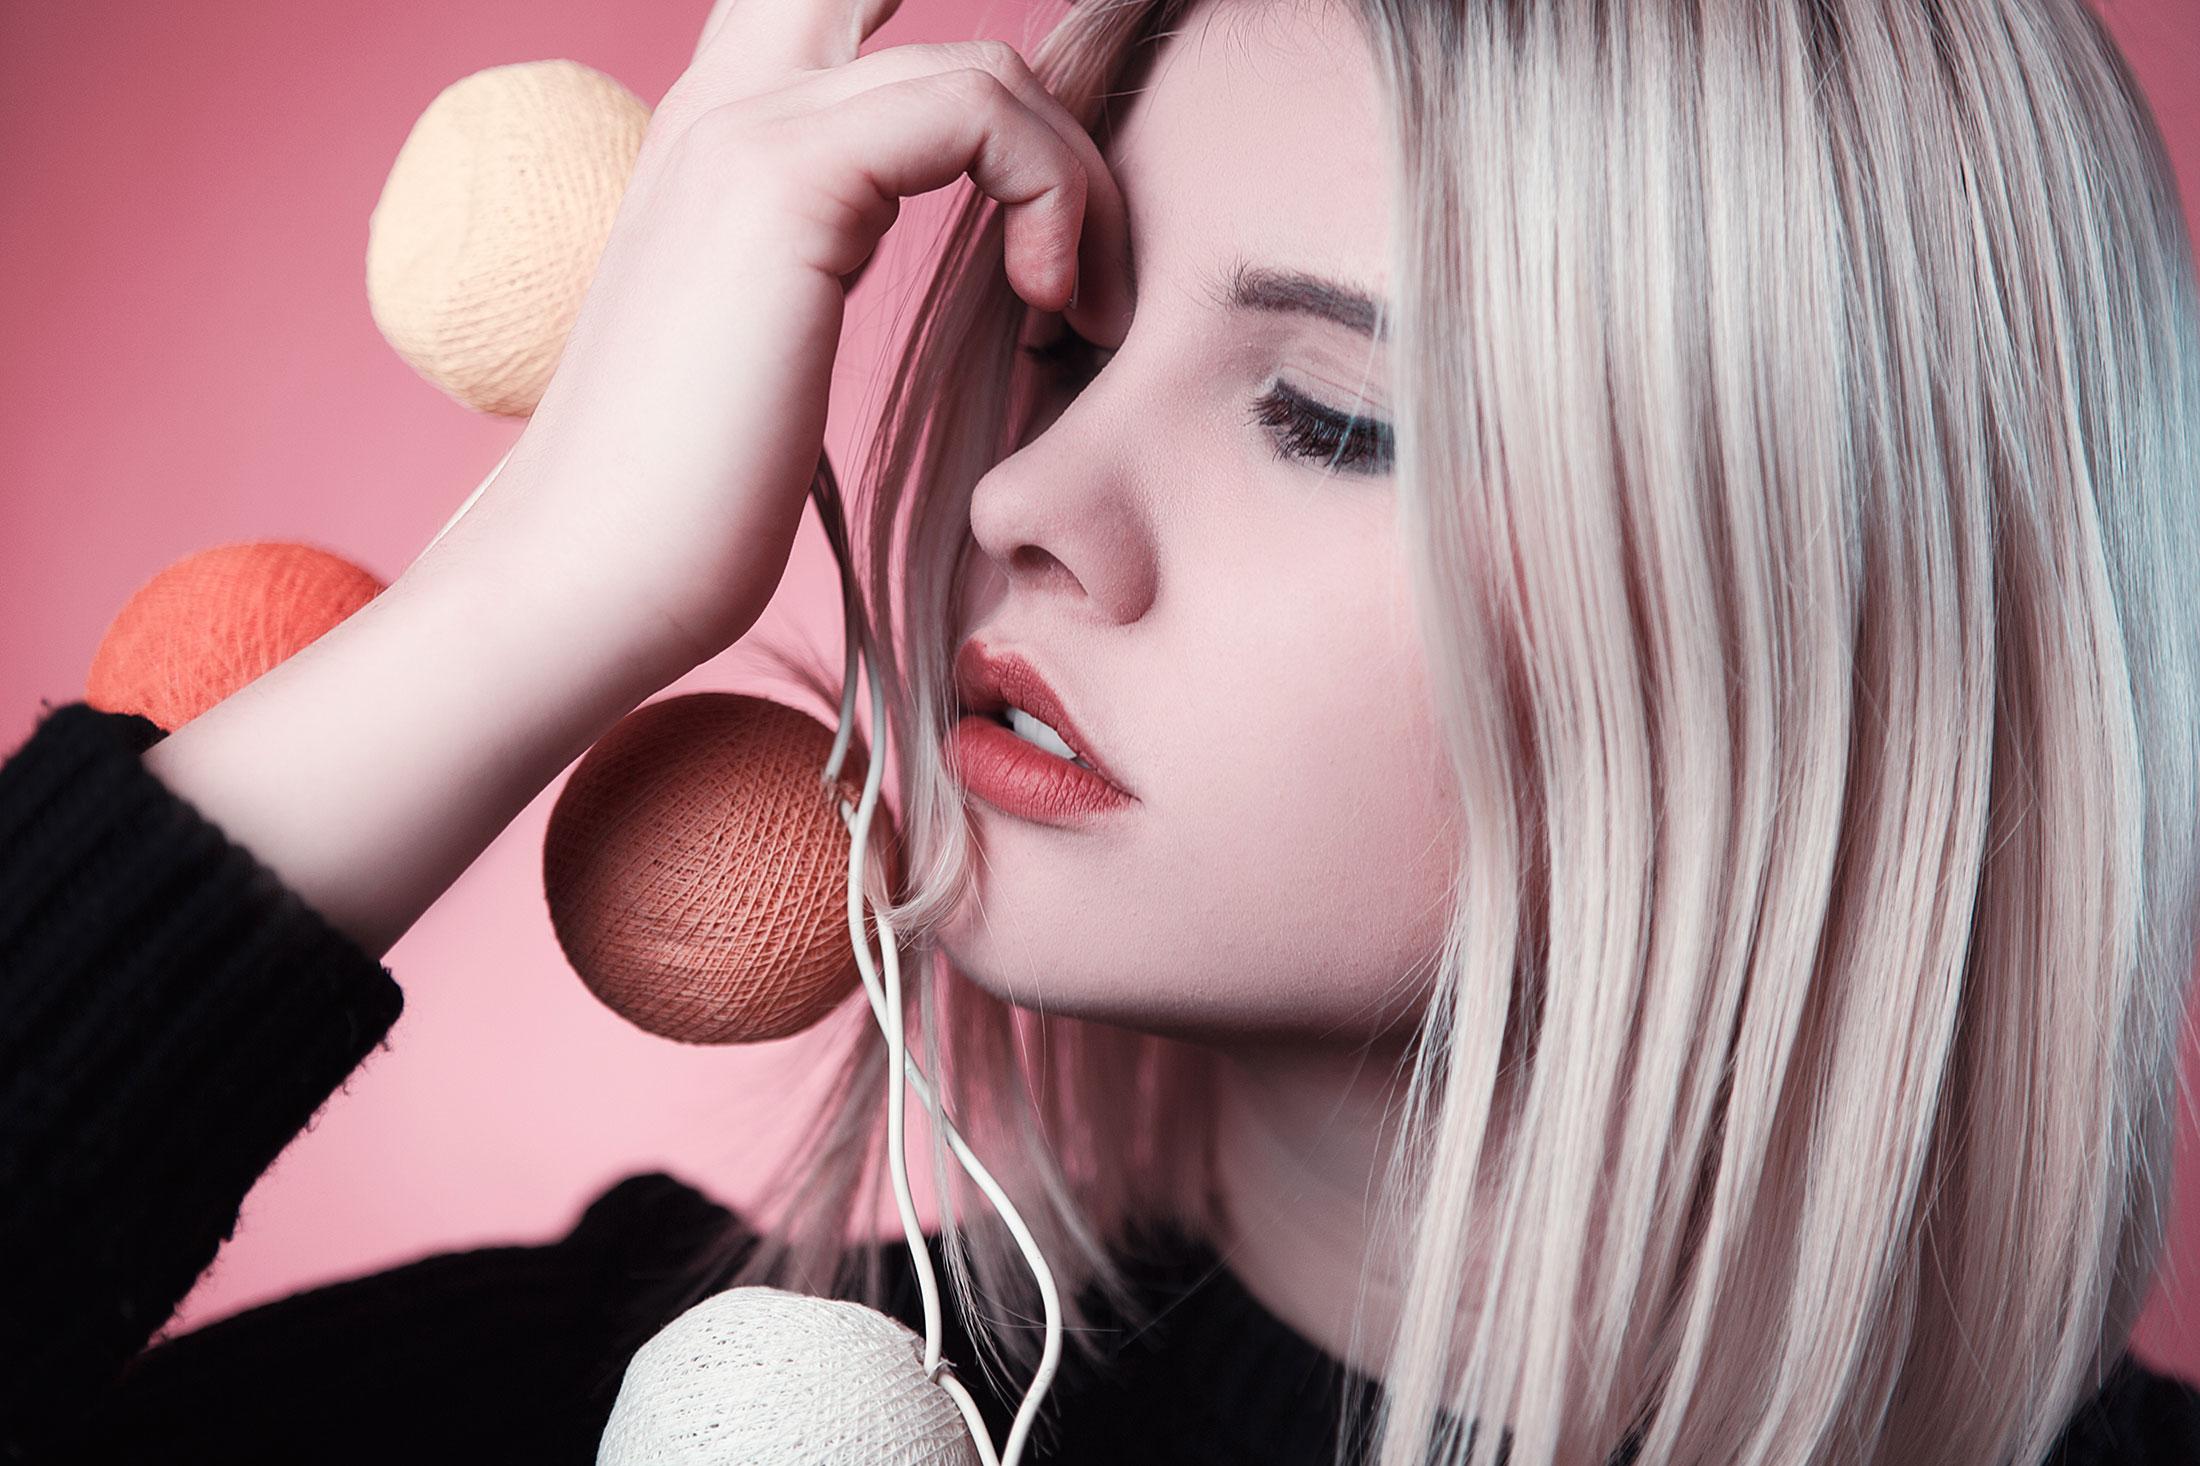 Les-Naly-Makeup-Girl-Women-Beauty-01.jpg